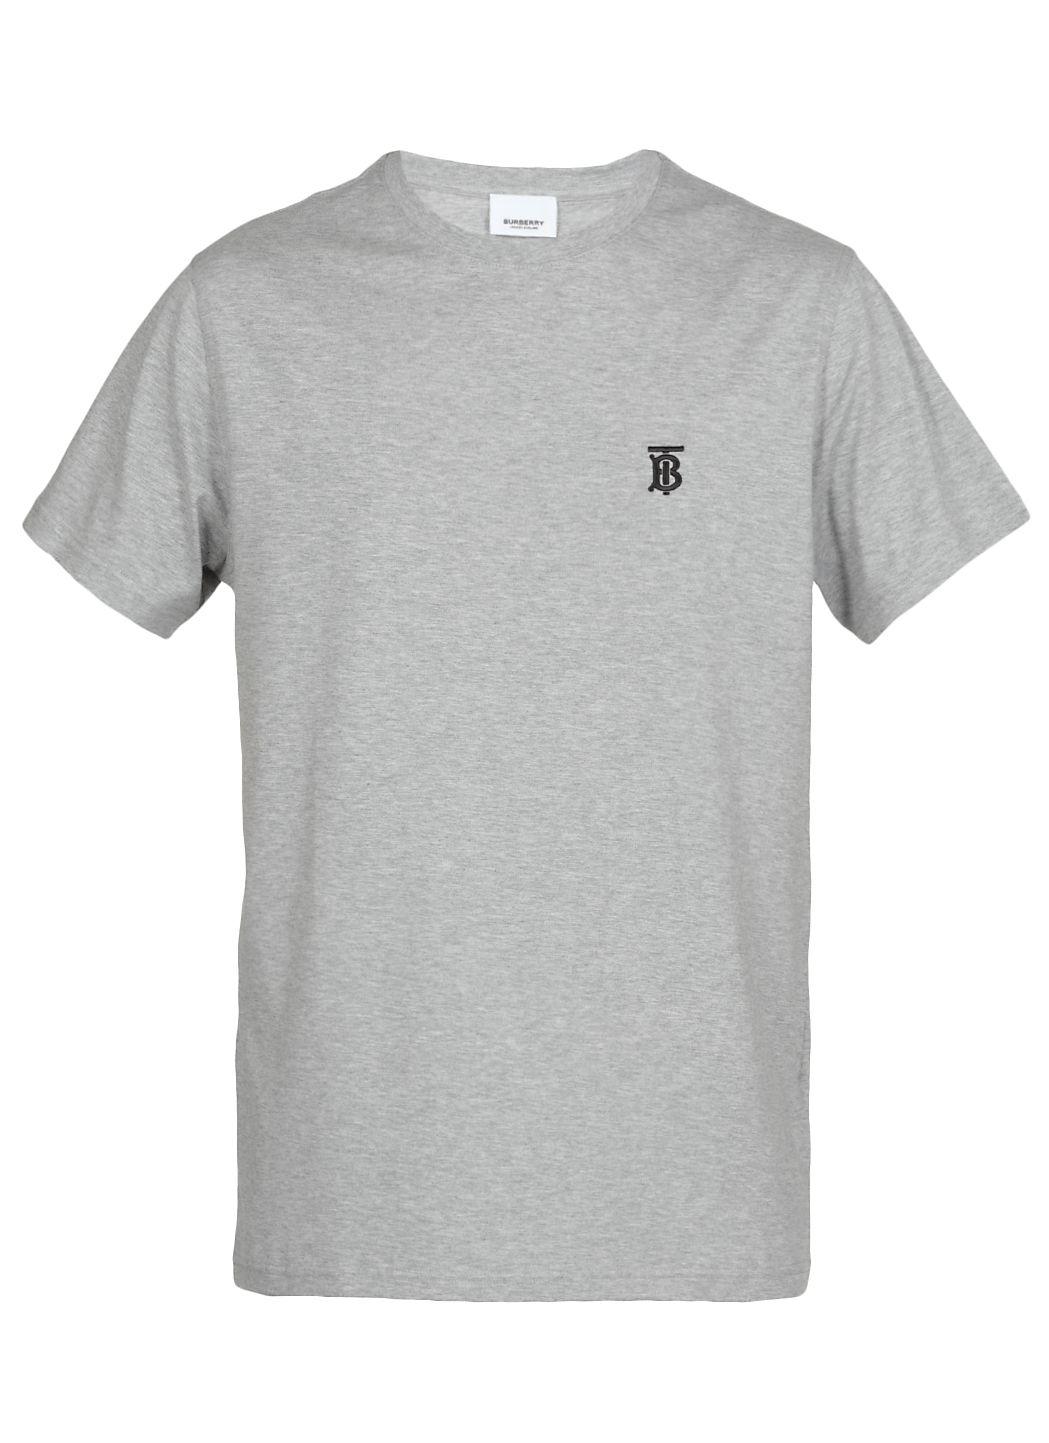 T-shirt con monogramma